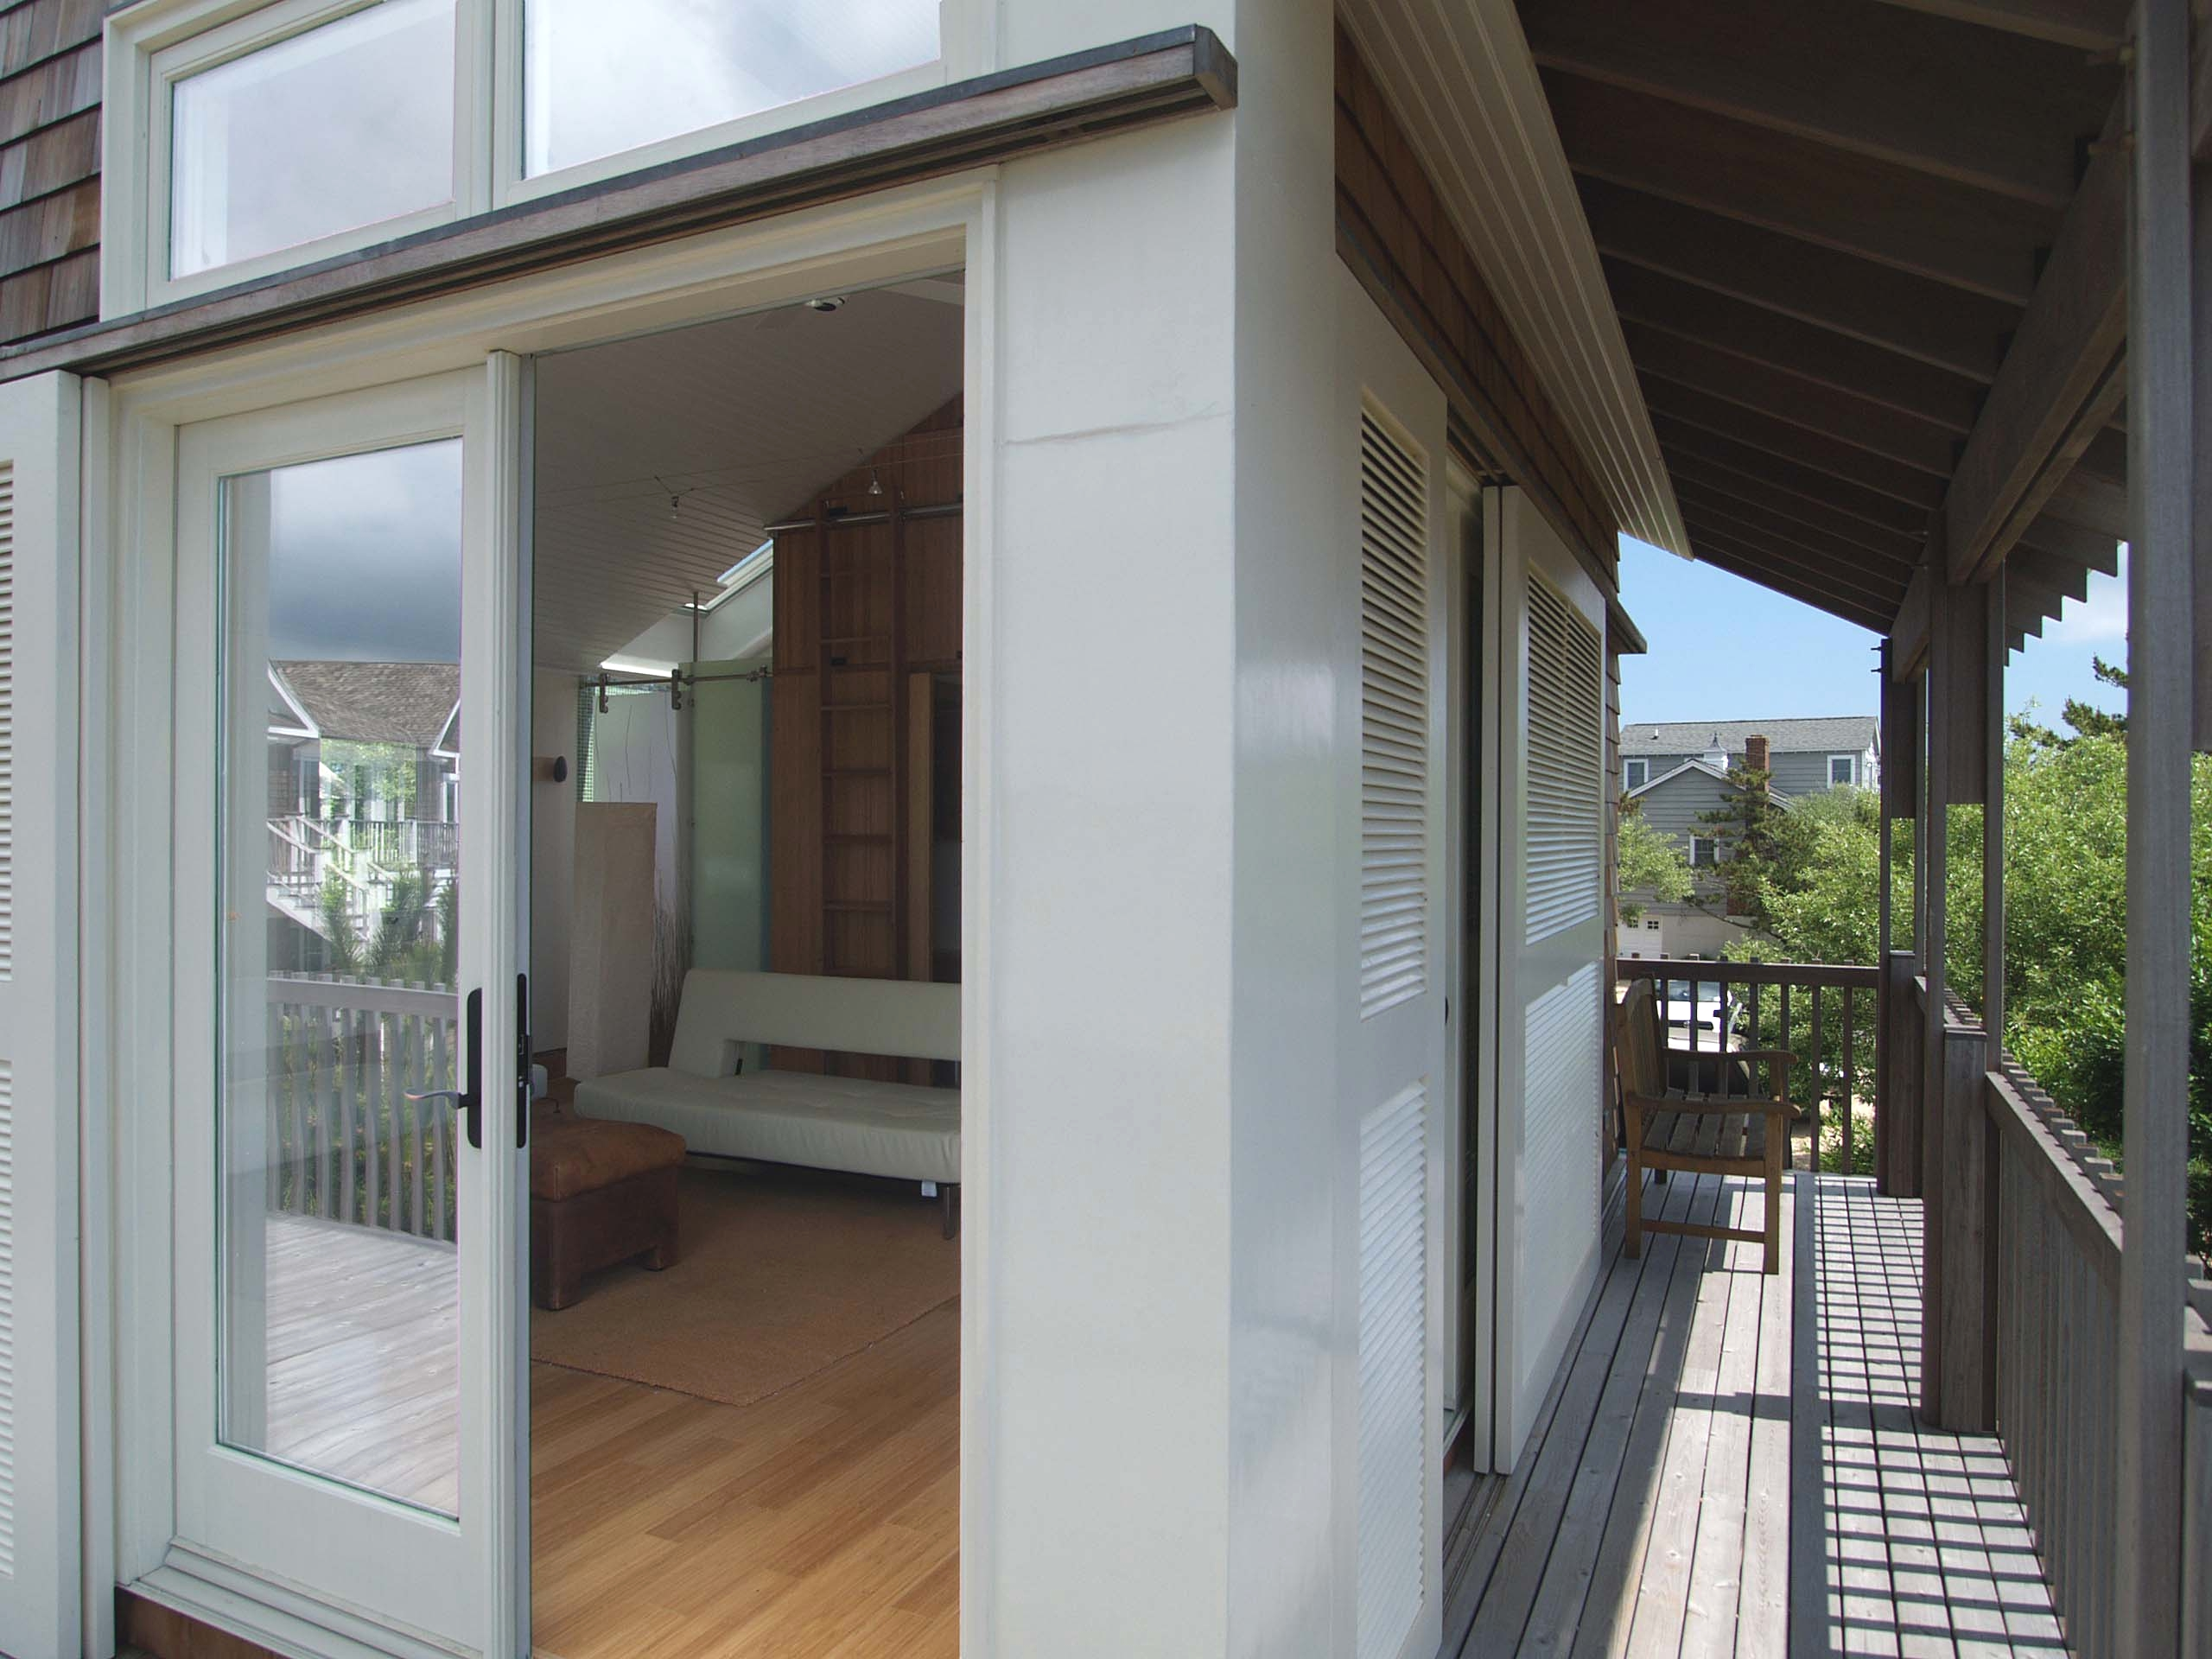 Modern Architecture Nashville Tn guest house | john teselle architecture | john teselle architecture